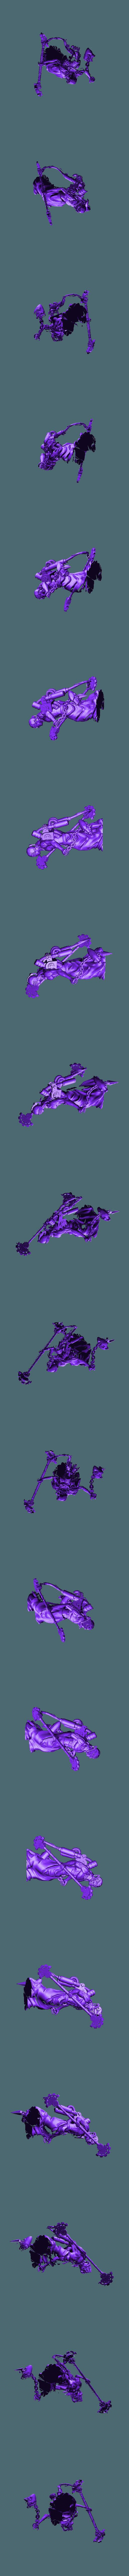 Fulgurite_4.2.stl Download free STL file Martian Electric Clergy • 3D print design, ErikTheHeretek